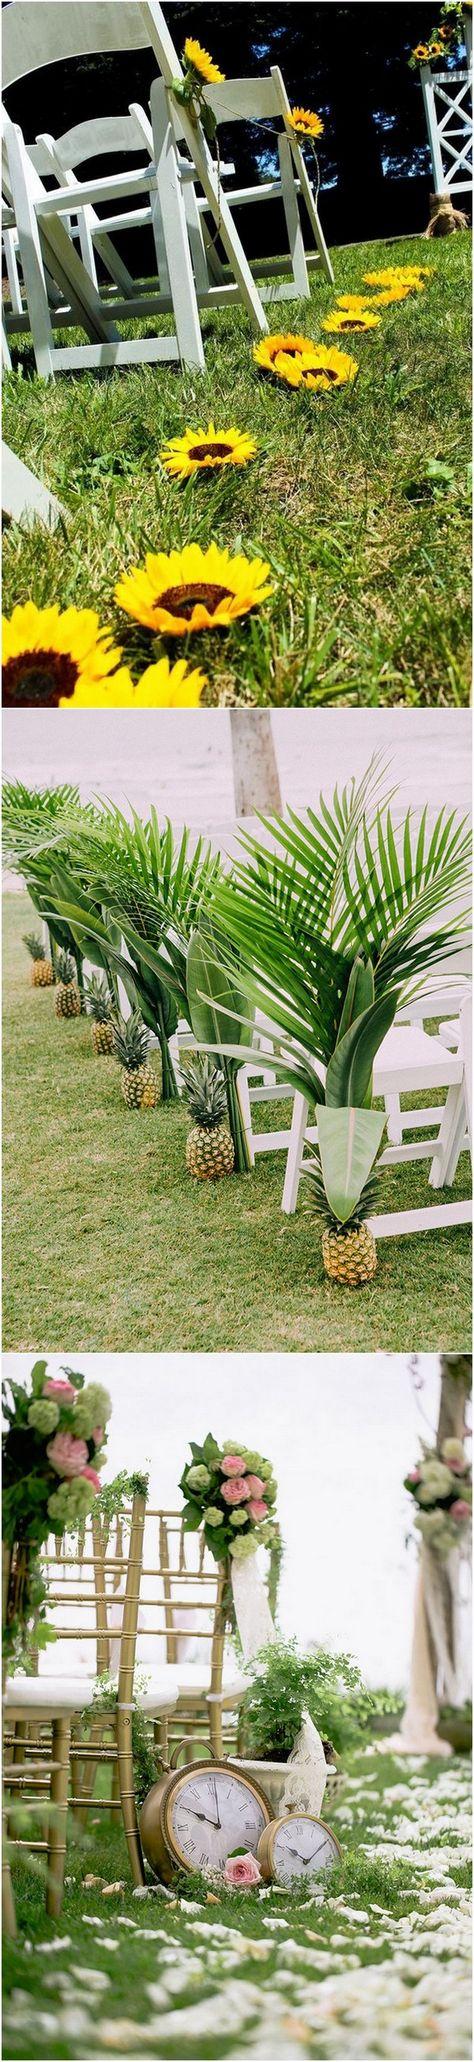 Wedding aisle decor ideas diy   Breathtaking Wedding Aisle Decoration Ideas to Steal  Page  of